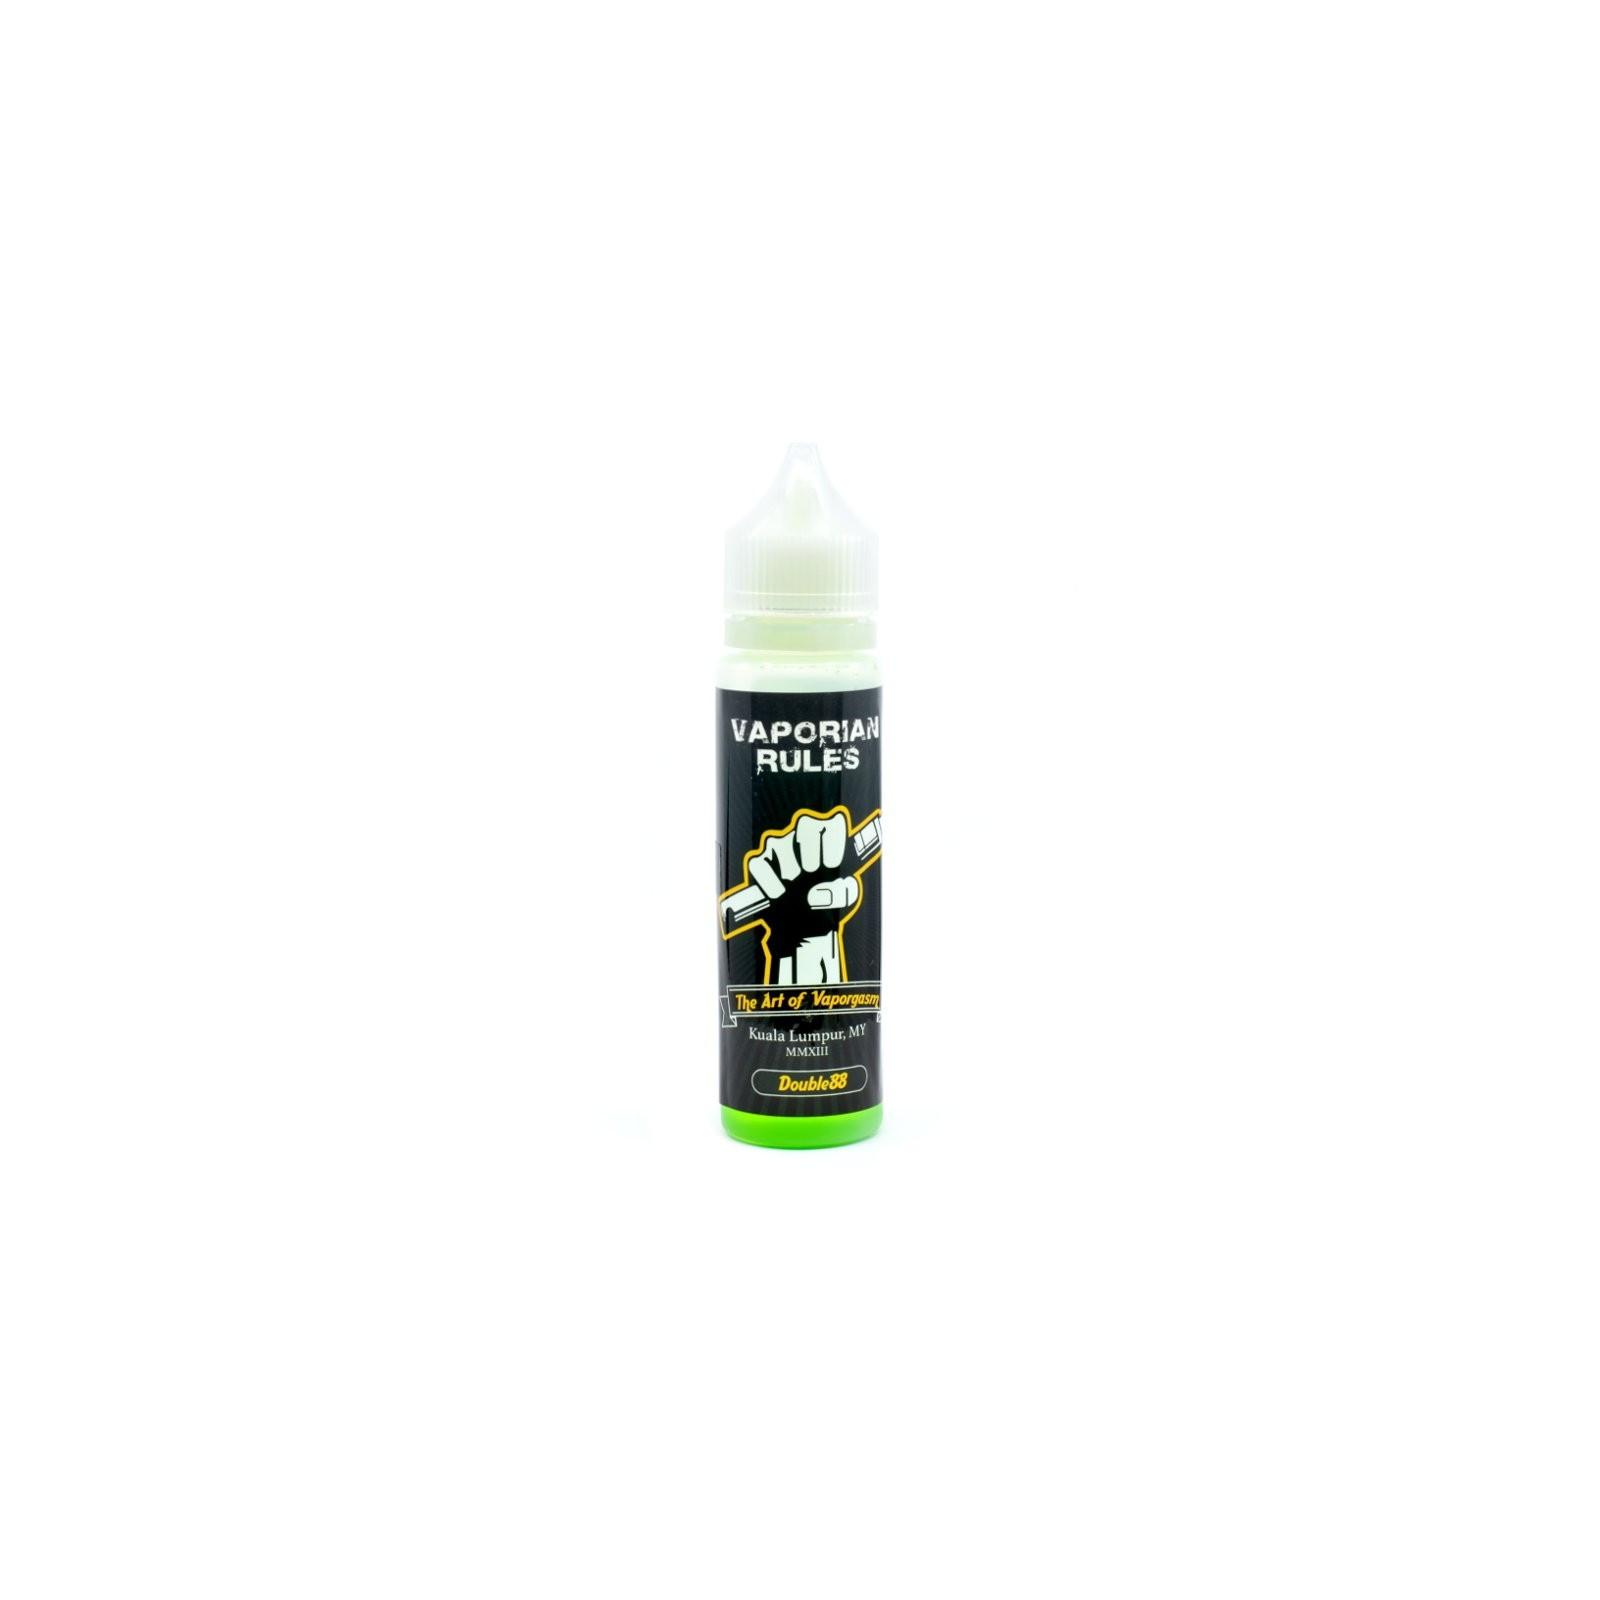 double 88 50 ml - Vaporian Rules